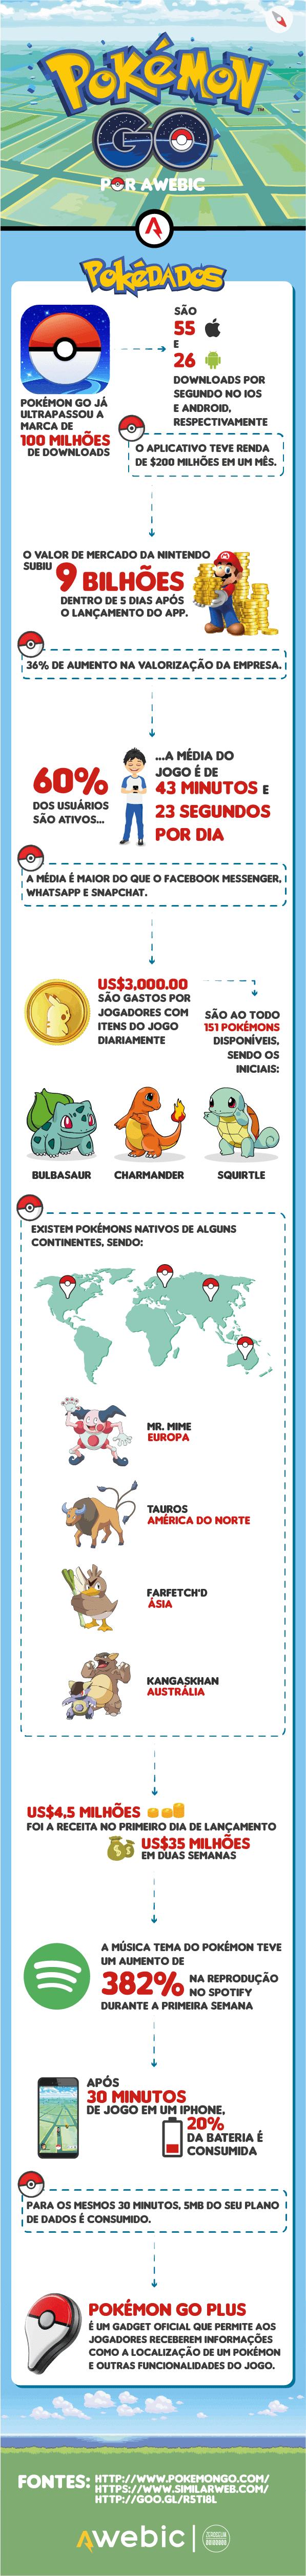 awebic infográfico pokémon go